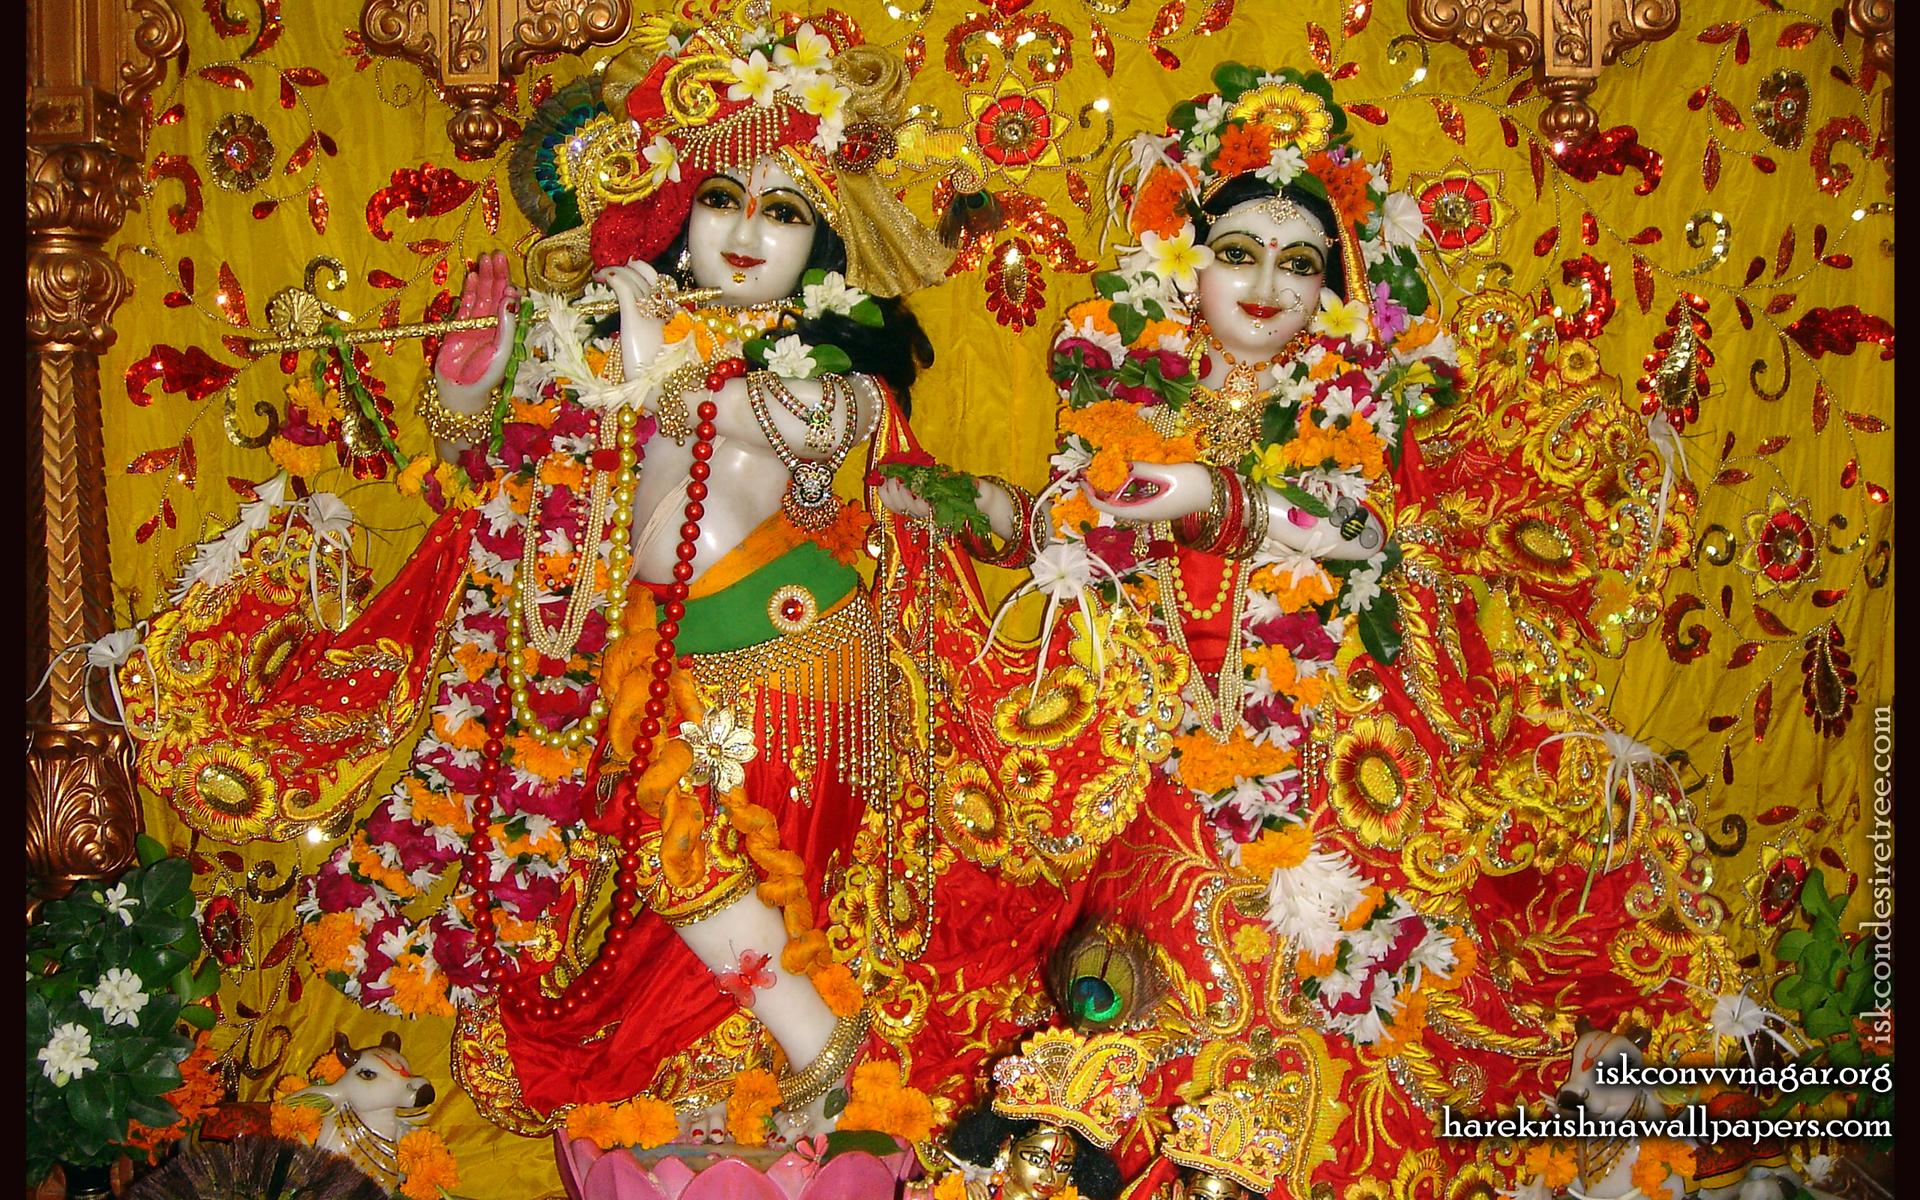 Sri Sri Radha Giridhari Wallpaper (024) Size 1920x1200 Download